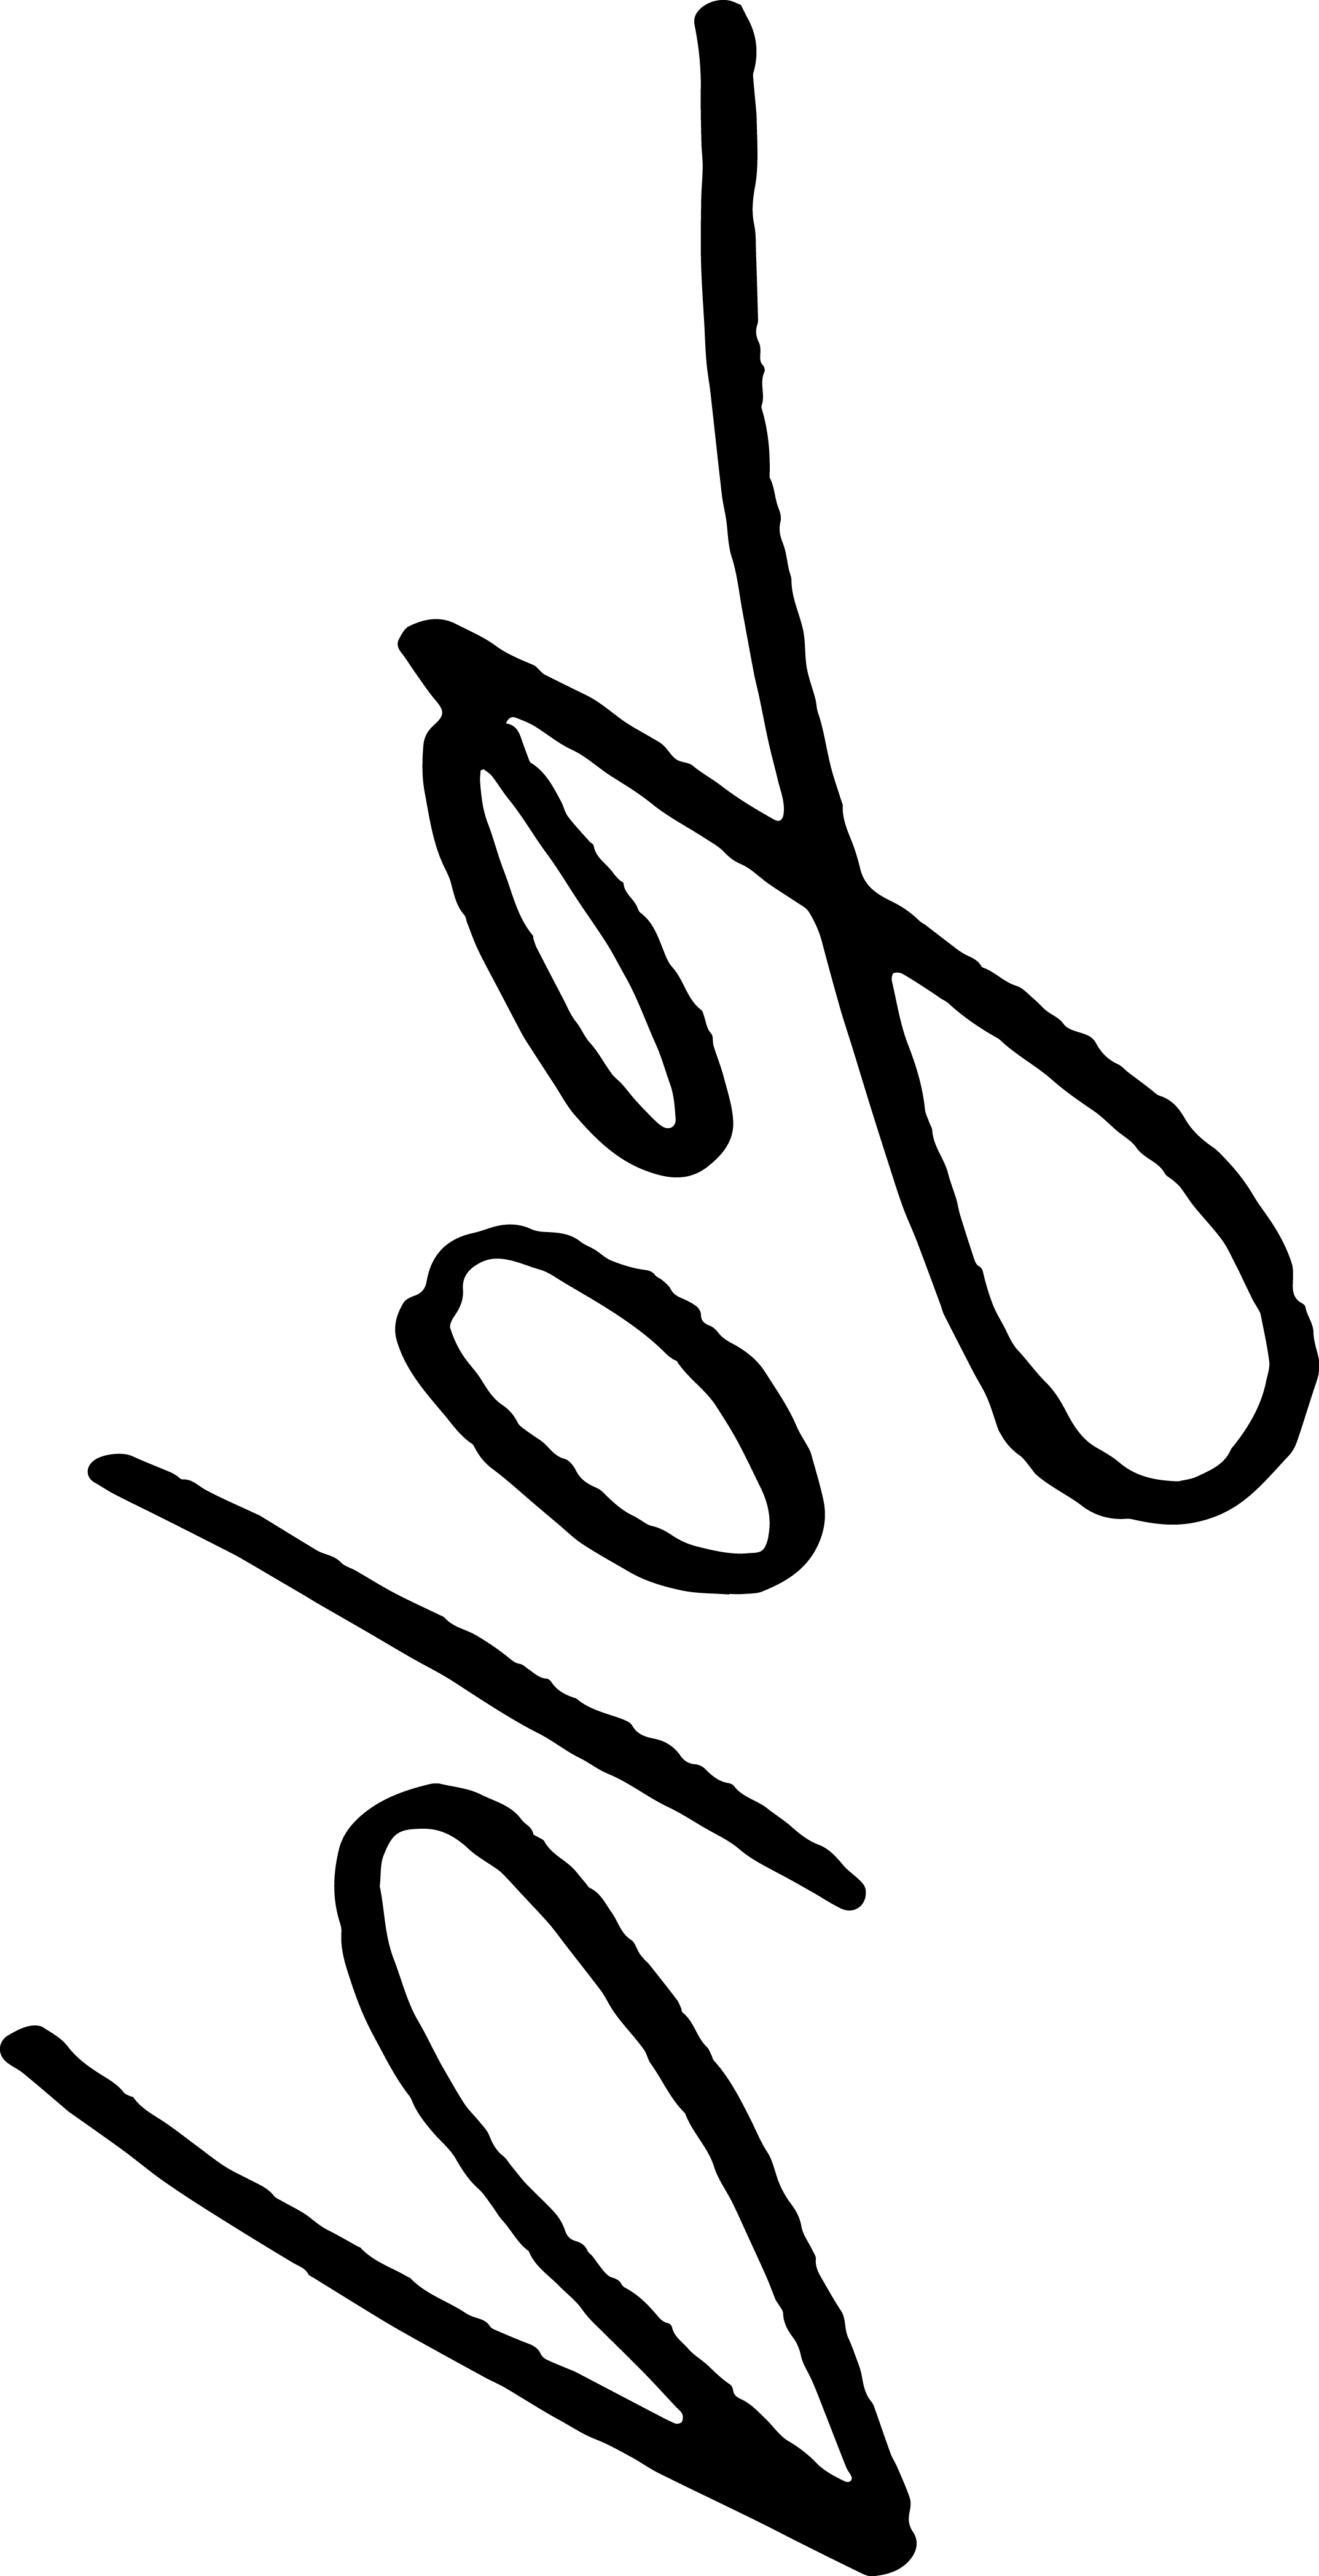 Image6[1].png